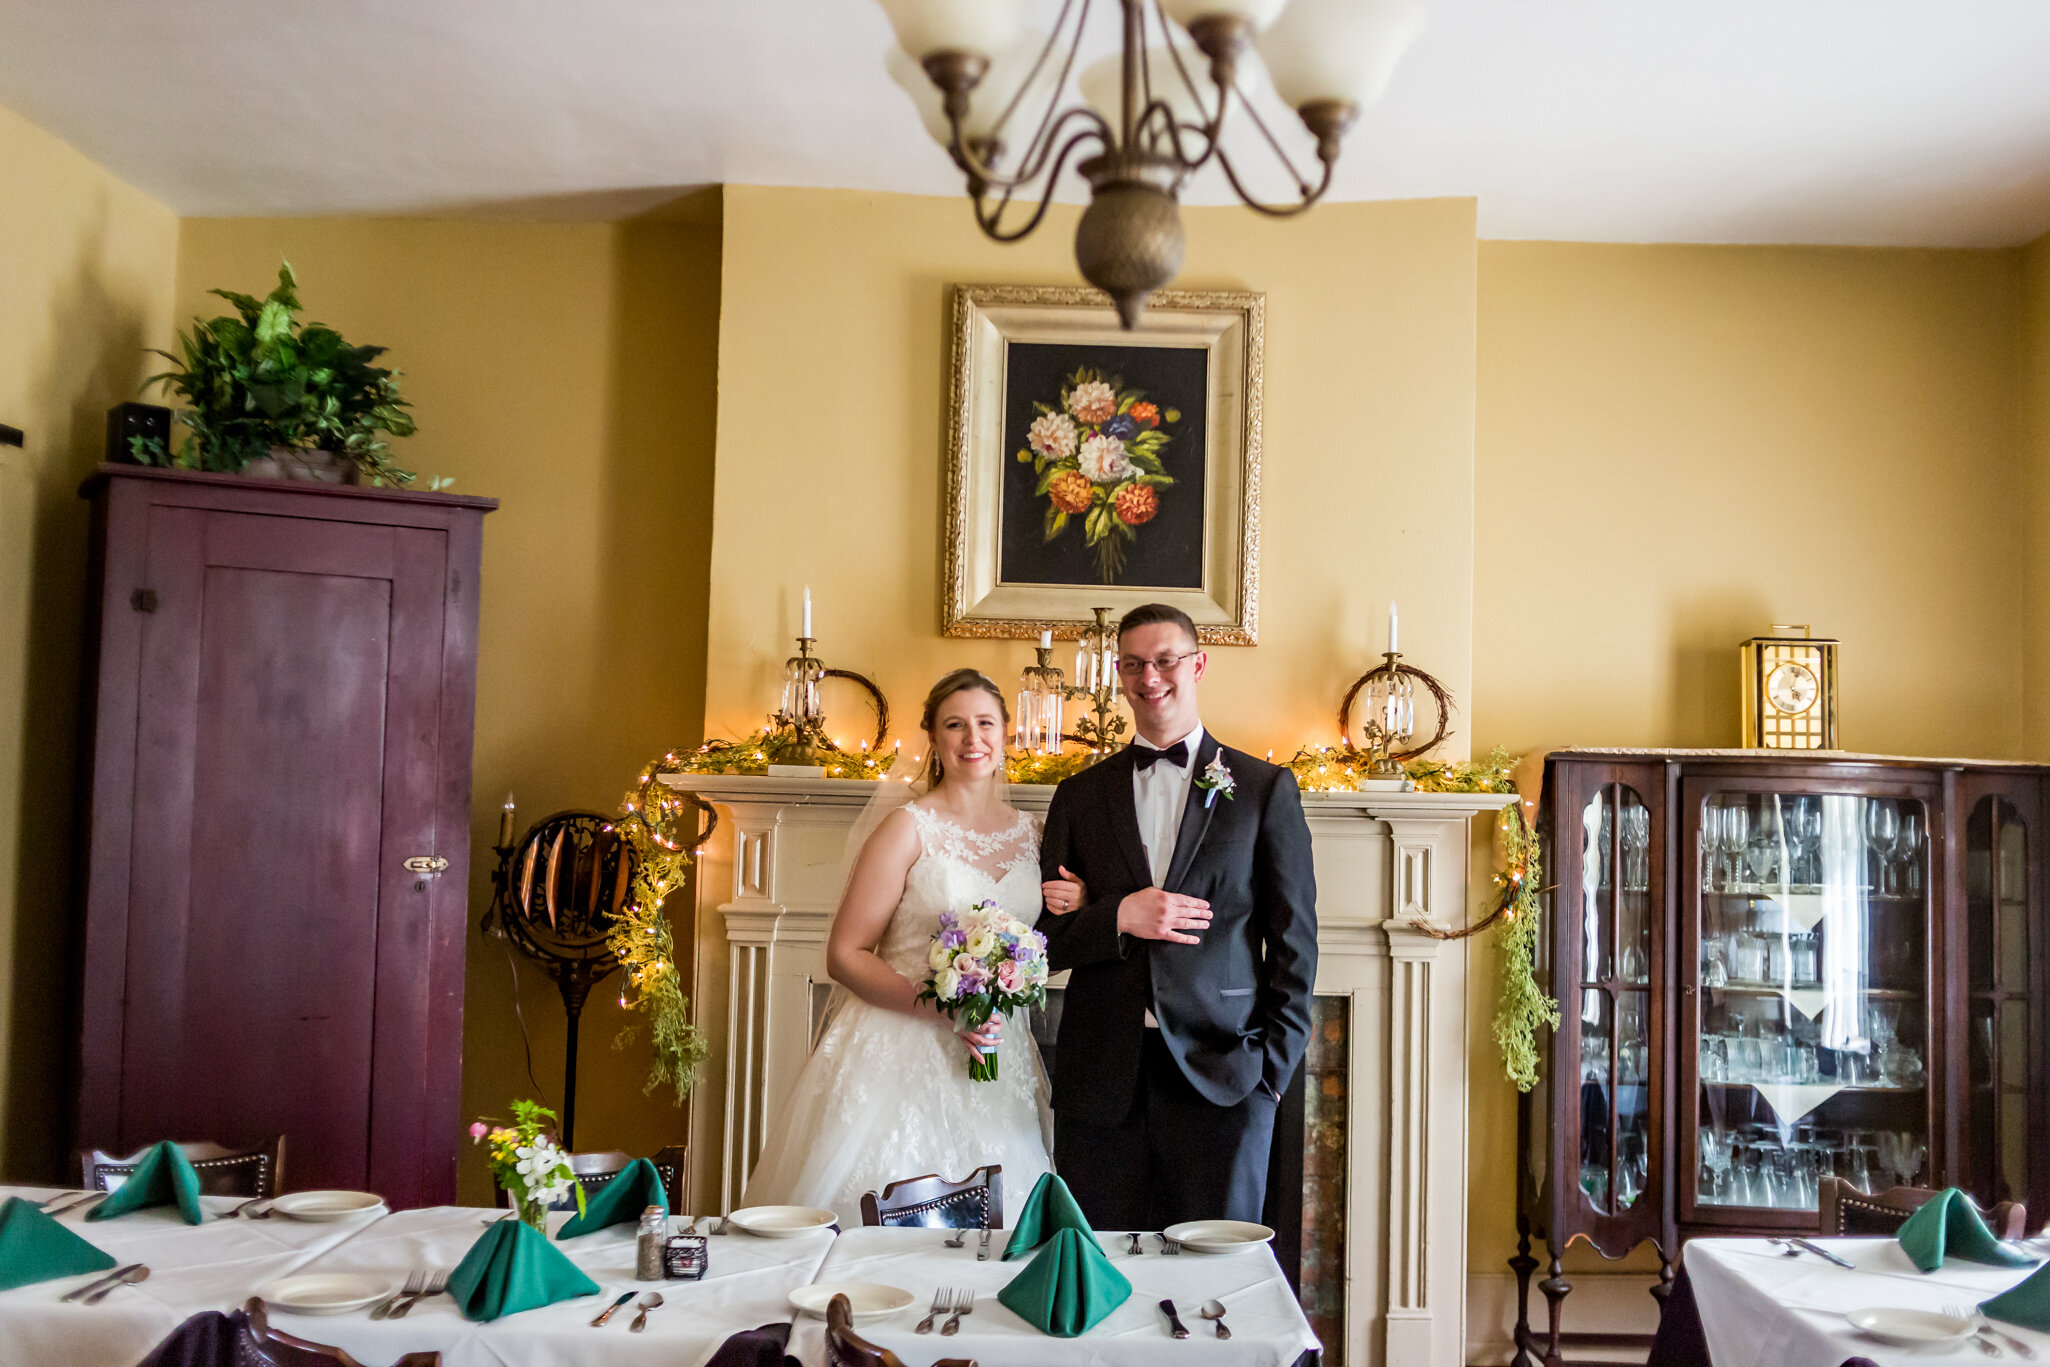 Dayton_Wedding_Photographer_Jessup1659.JPG